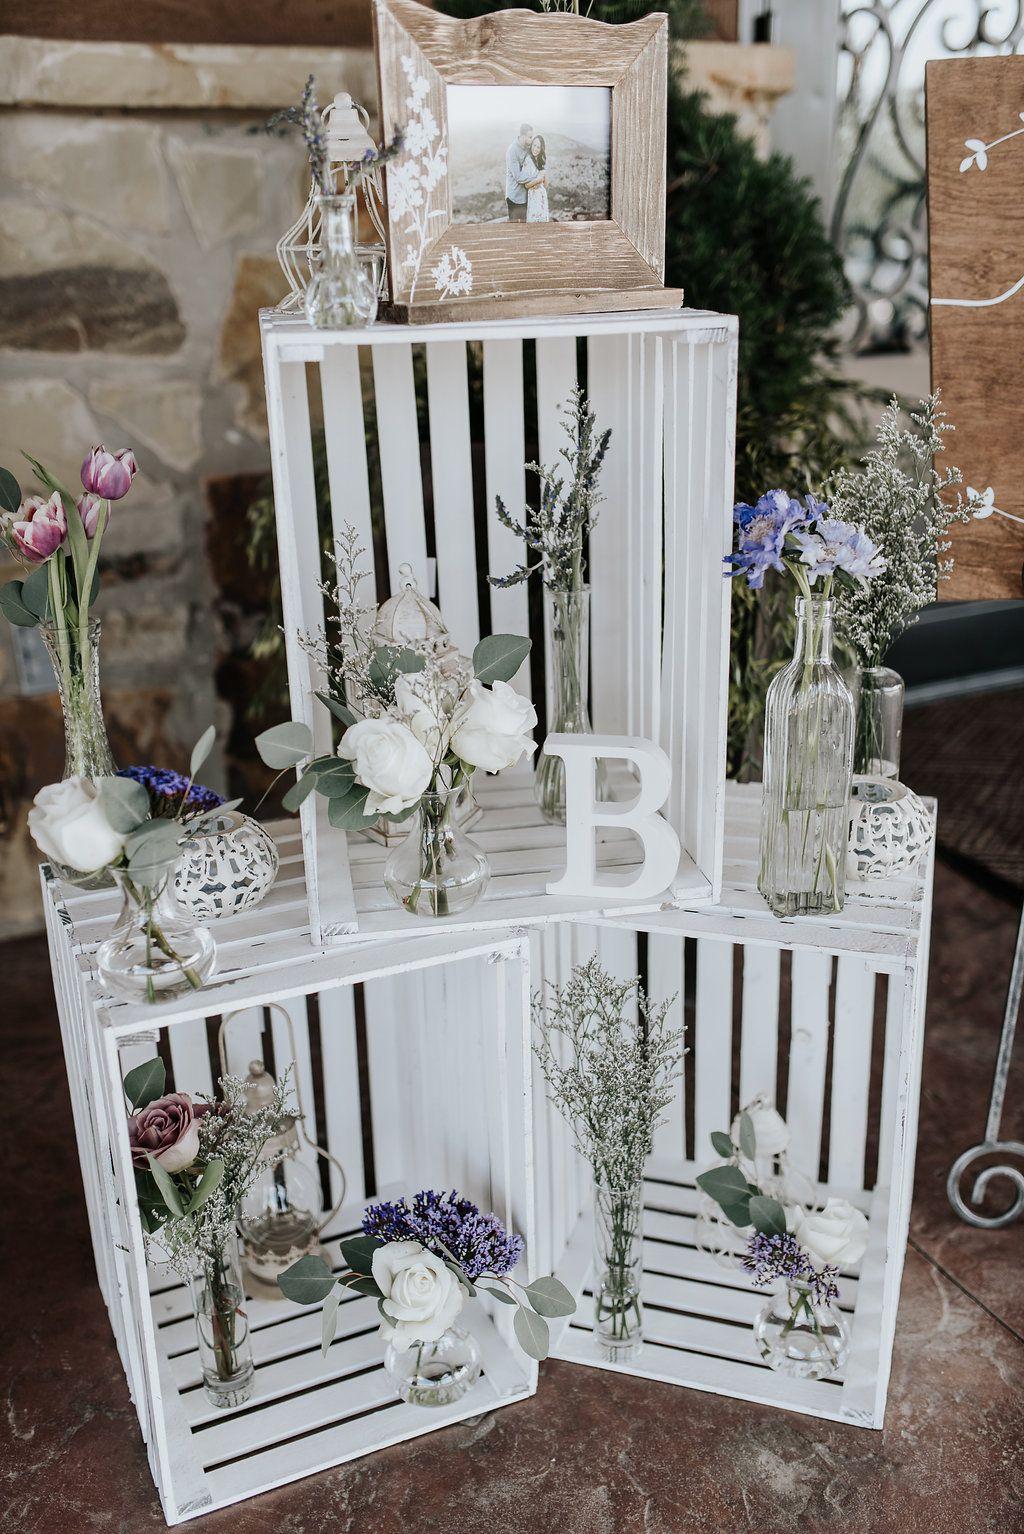 Wedding entry decoration ideas  white  lavender wedding decor  natural wedding decorations